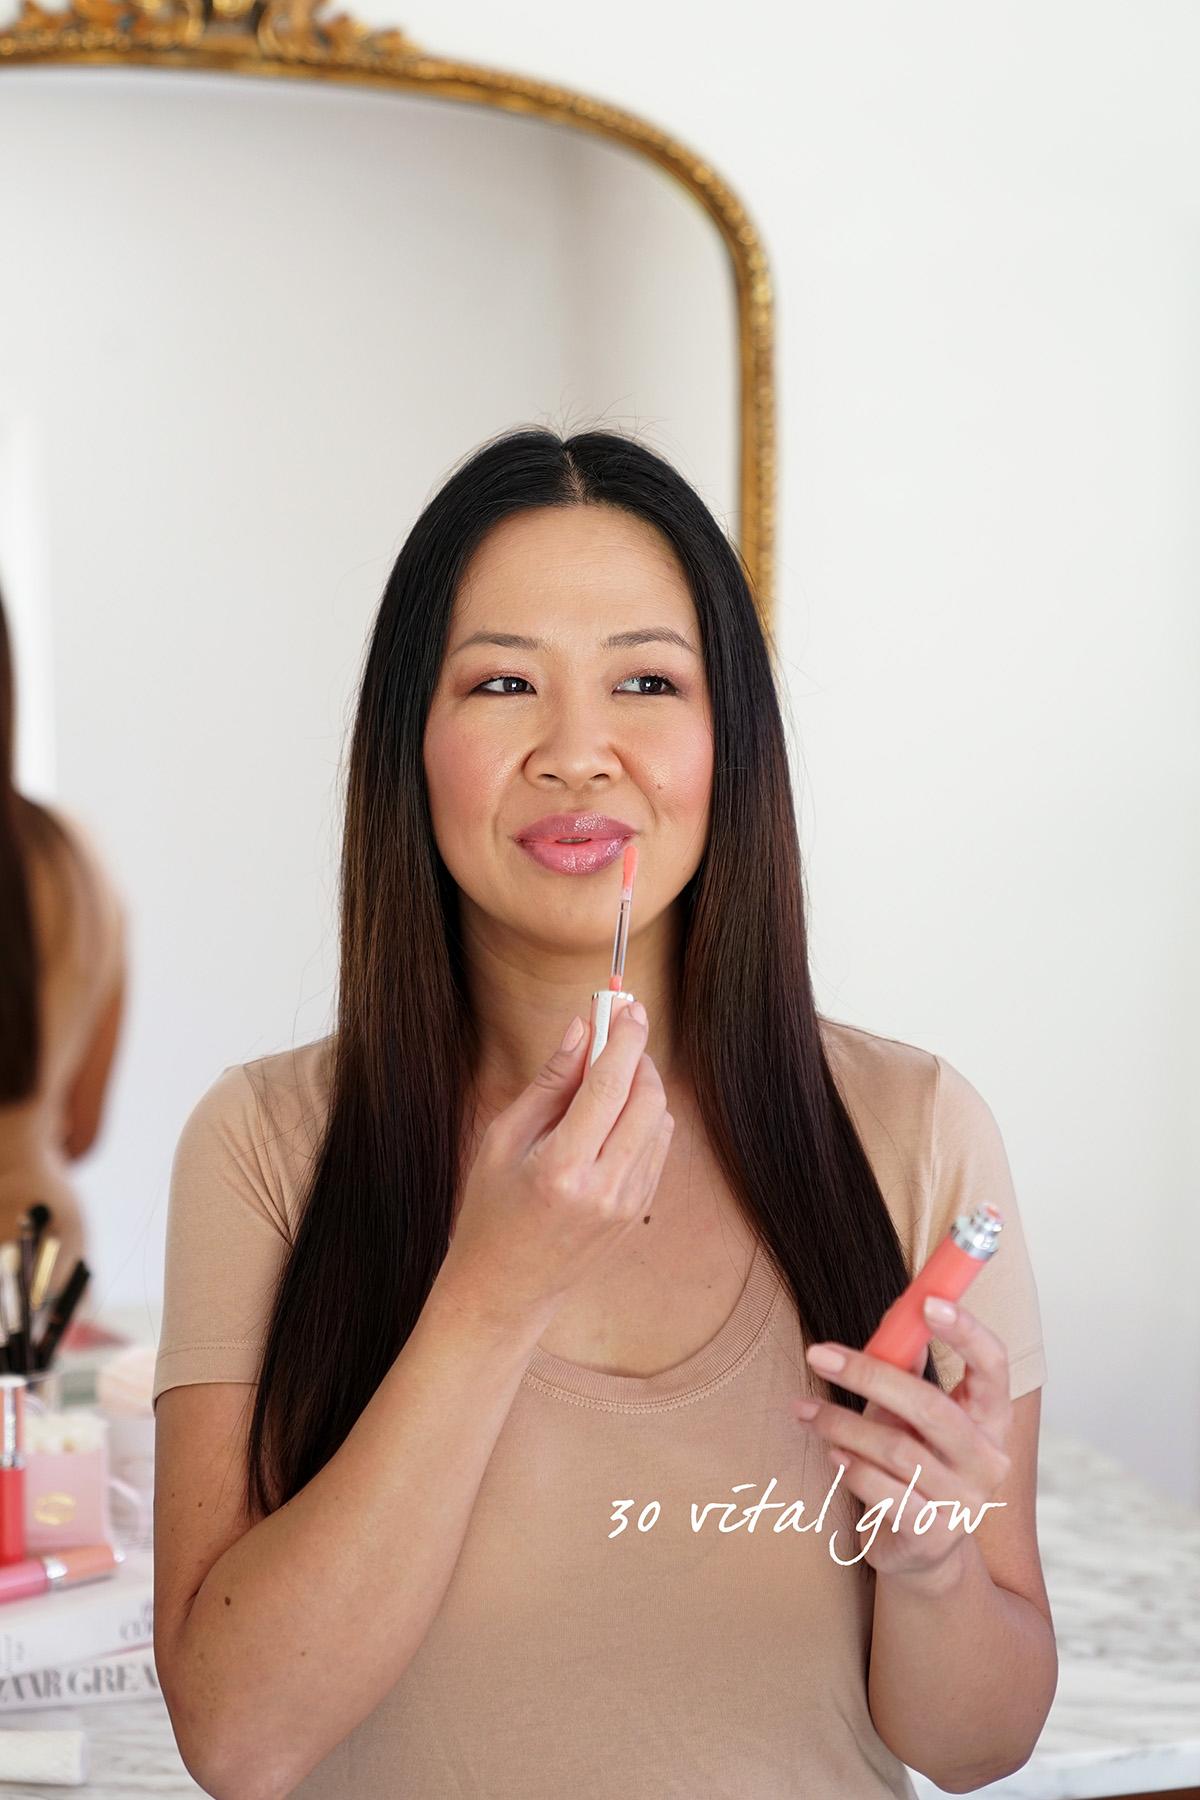 Givenchy Le Rose Perfecto Liquid Balm 30 Vital Glow